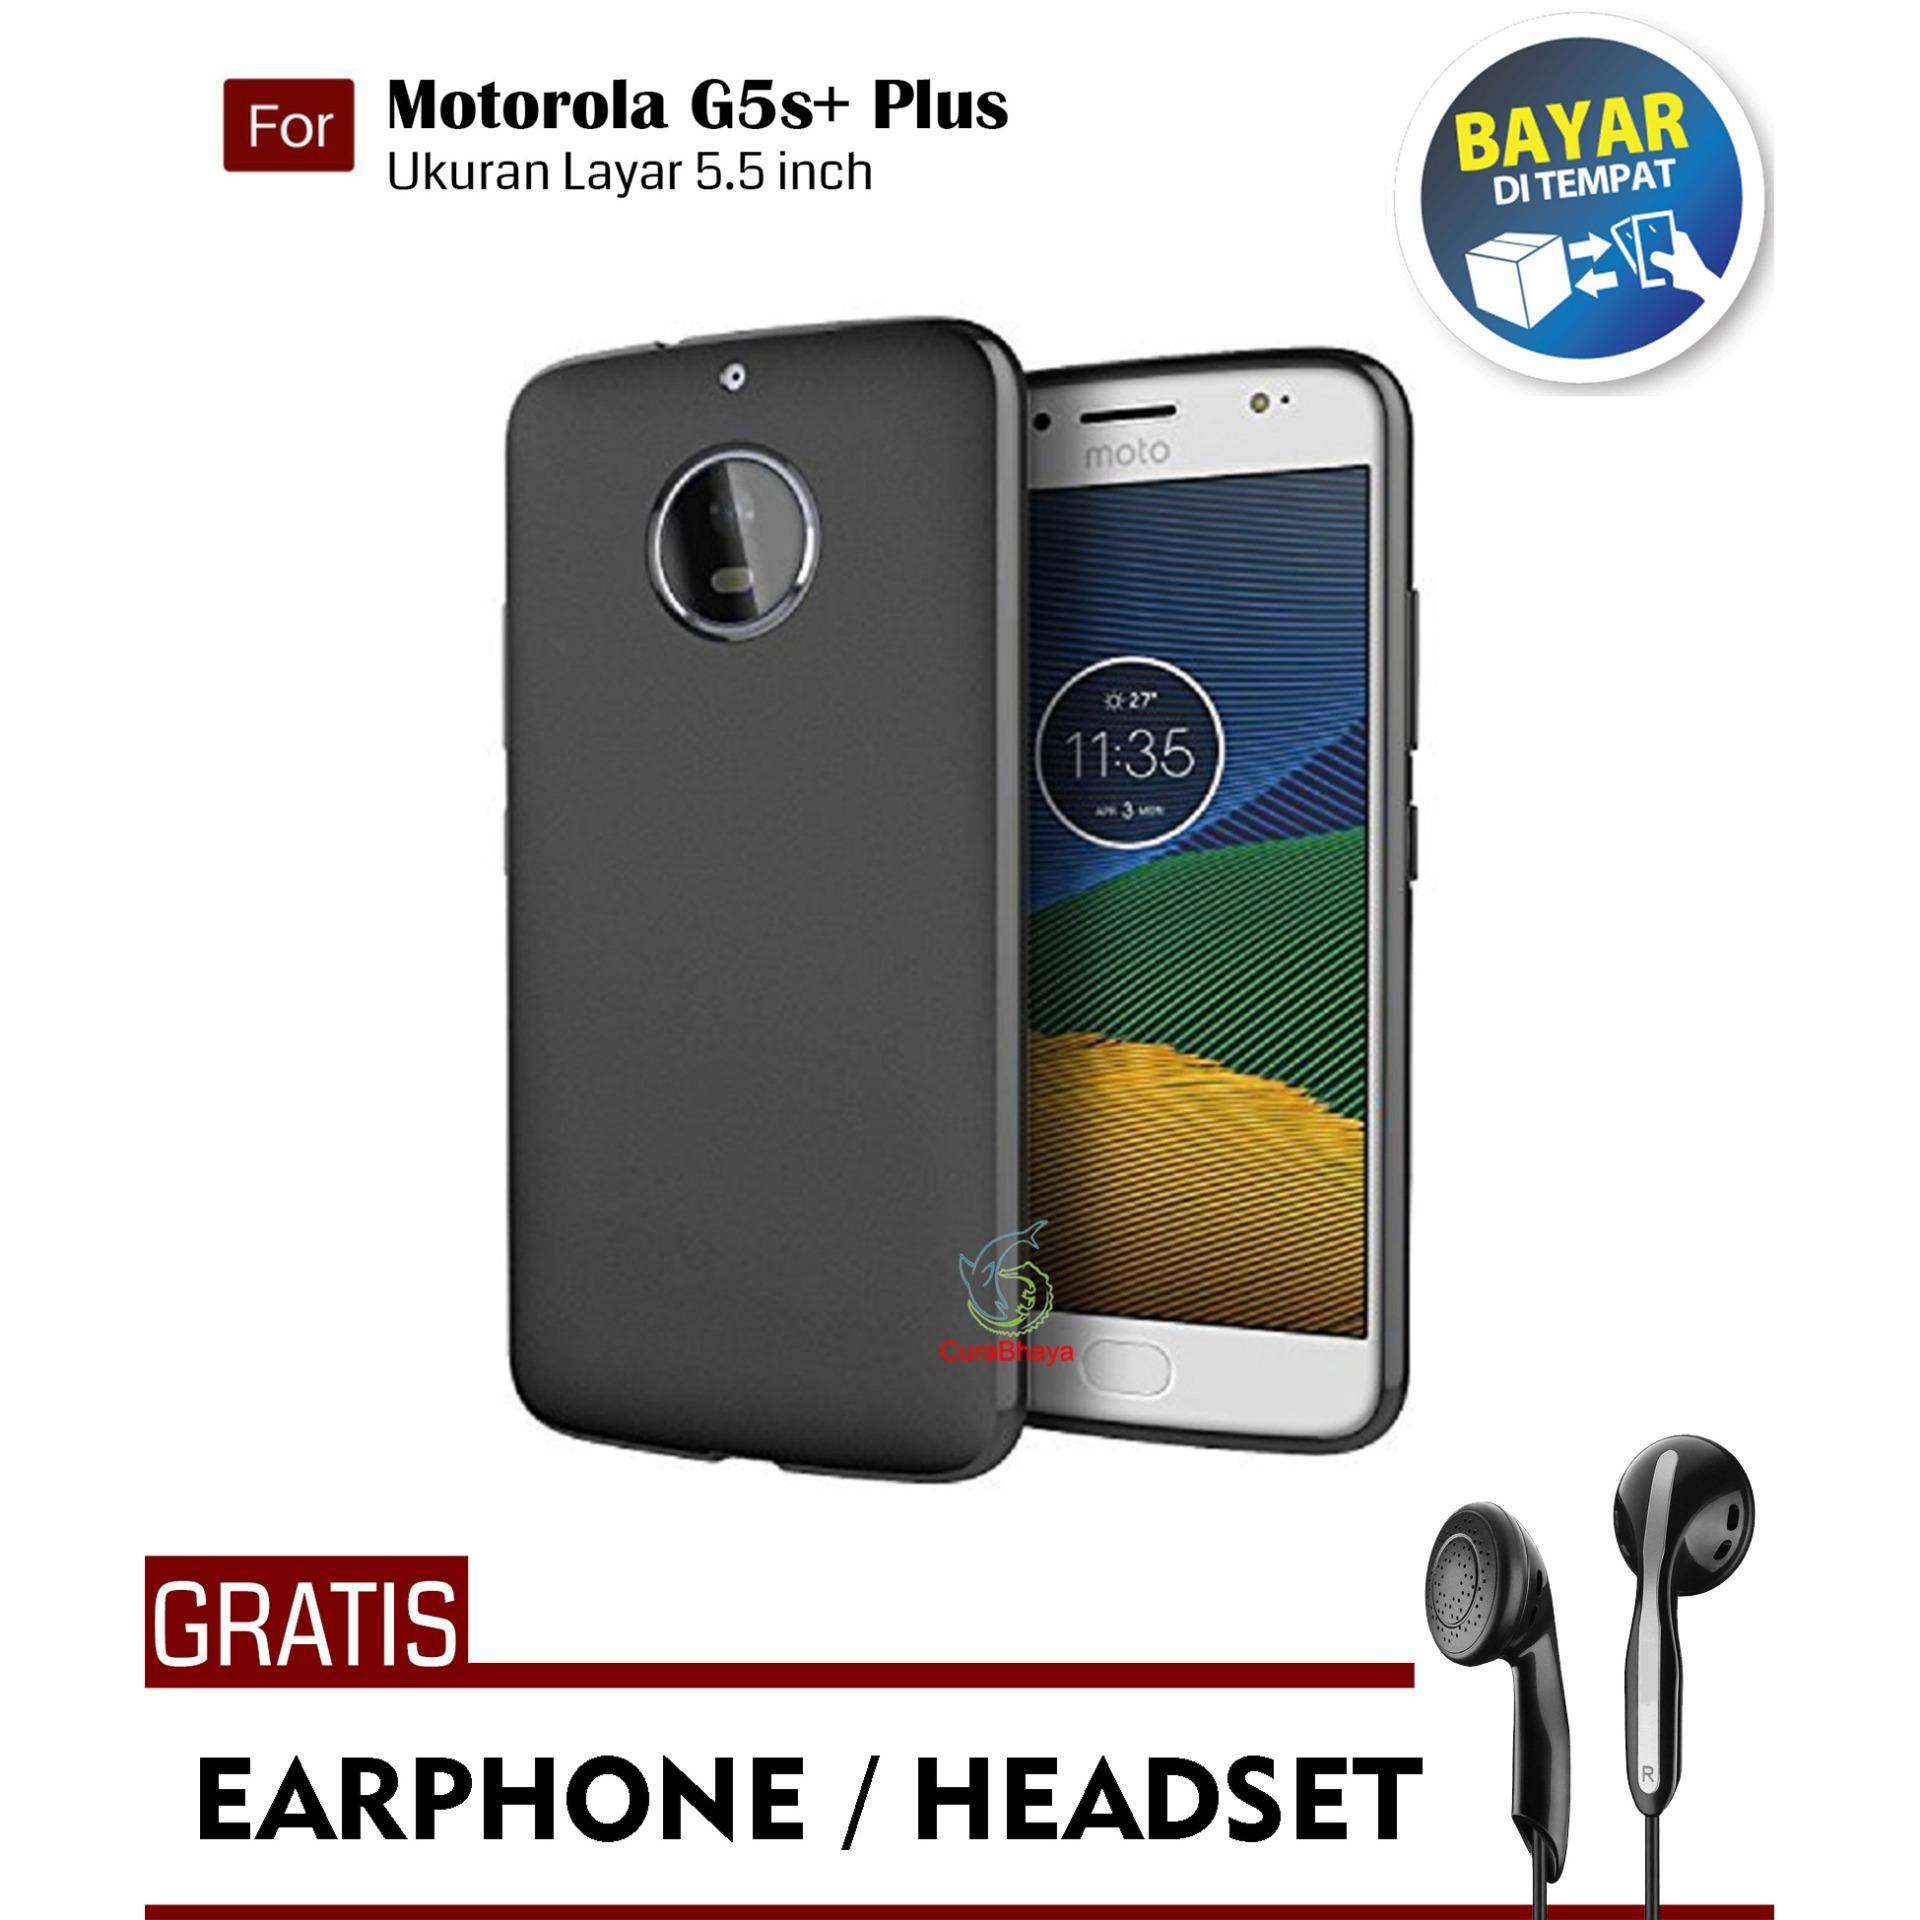 Harga Jual Case For Motorola Moto G X1032 45 Slim Soft Hitam Vr Ultrathin Jelly Softcase